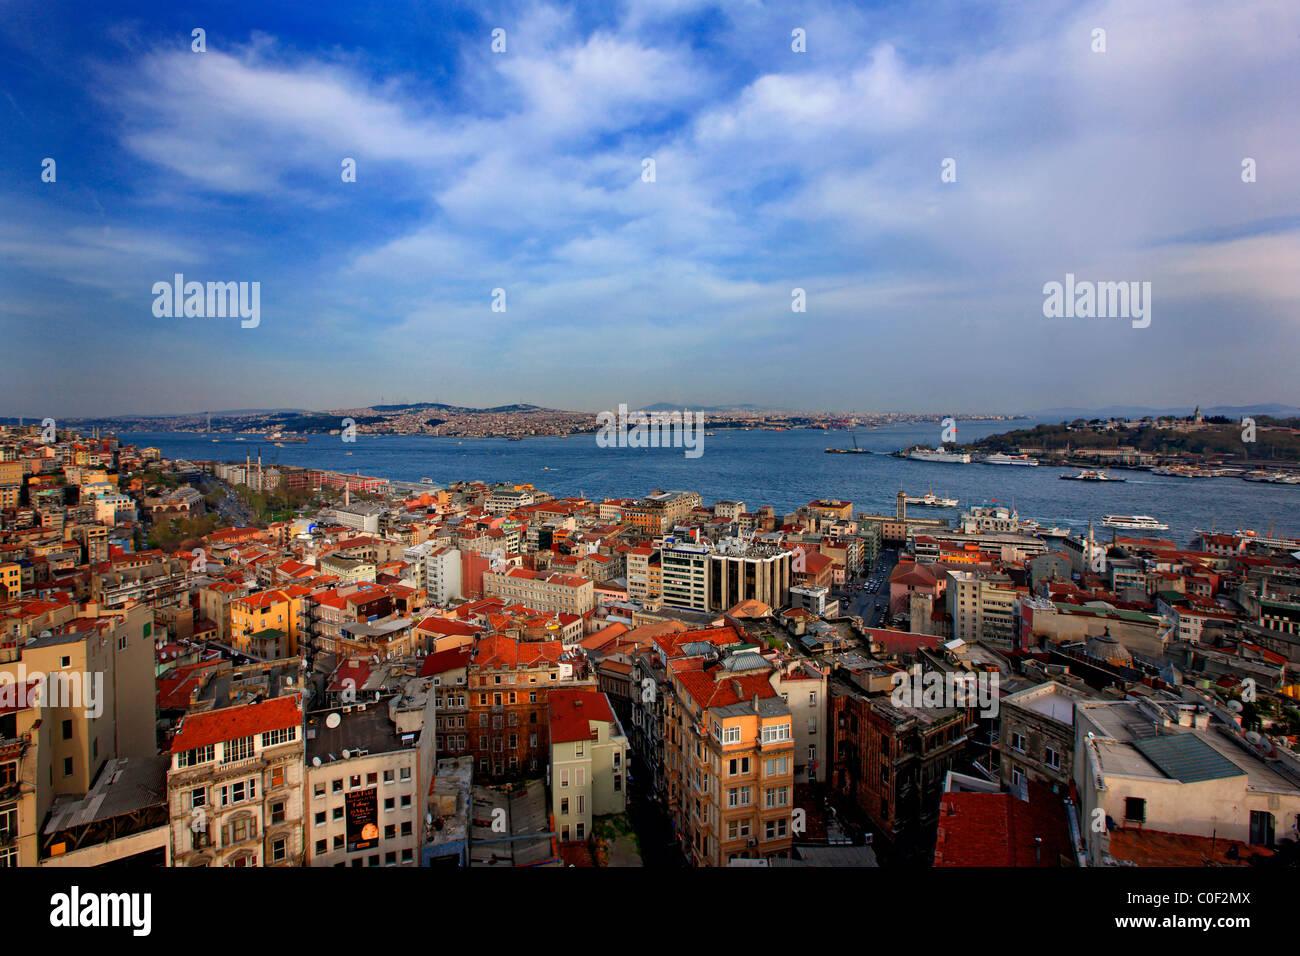 Panoramablick auf Istanbul vom Galata-Turm. Turkei Stockbild